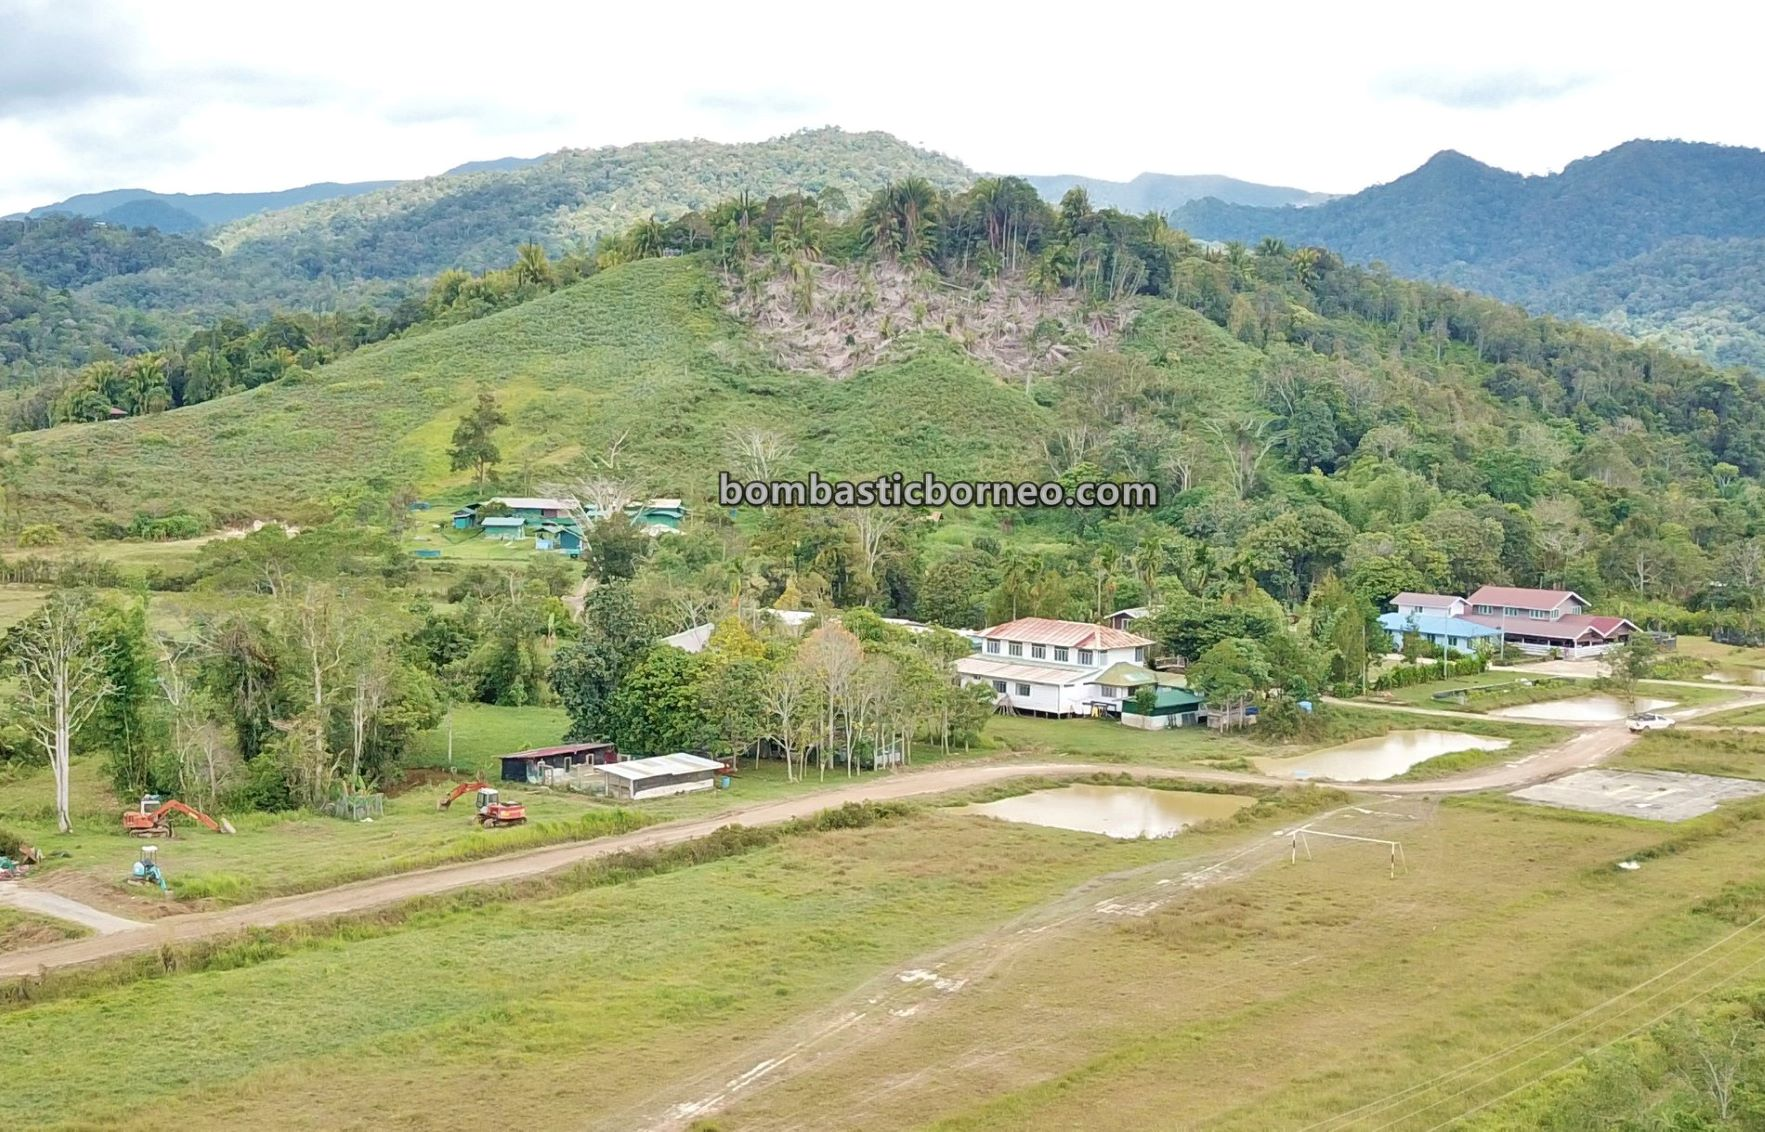 Kelabit Highlands, adventure, authentic, exploration, Dayak, native, tribe, Malaysia, Sarawak, Miri, Tourism, Borneo, 探索婆罗洲砂拉越高原, 巴里奥内陆原住民, 加拉毕族著部落,